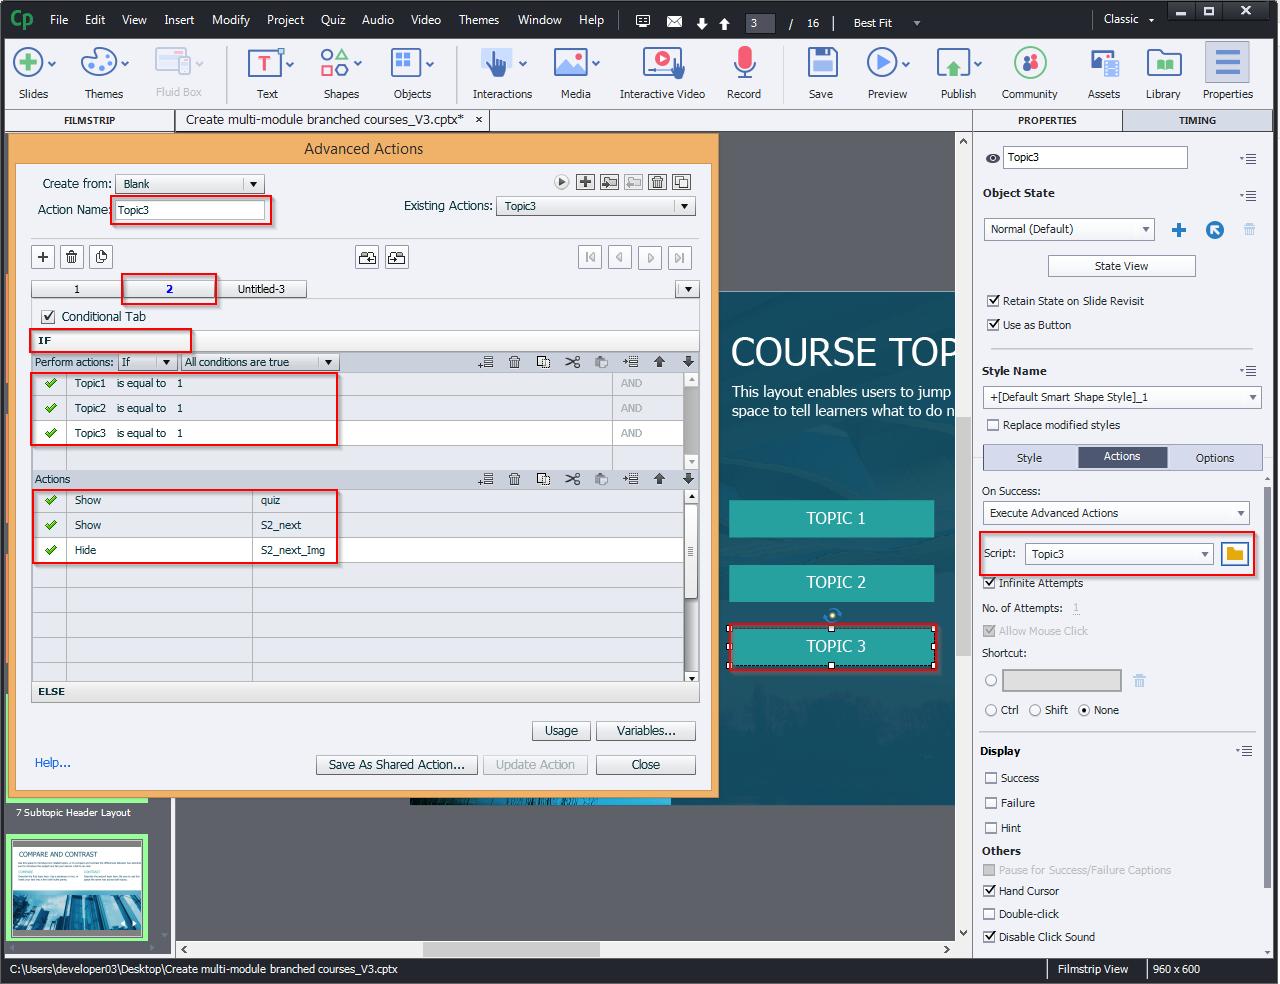 Create multi-module branched courses 10.7